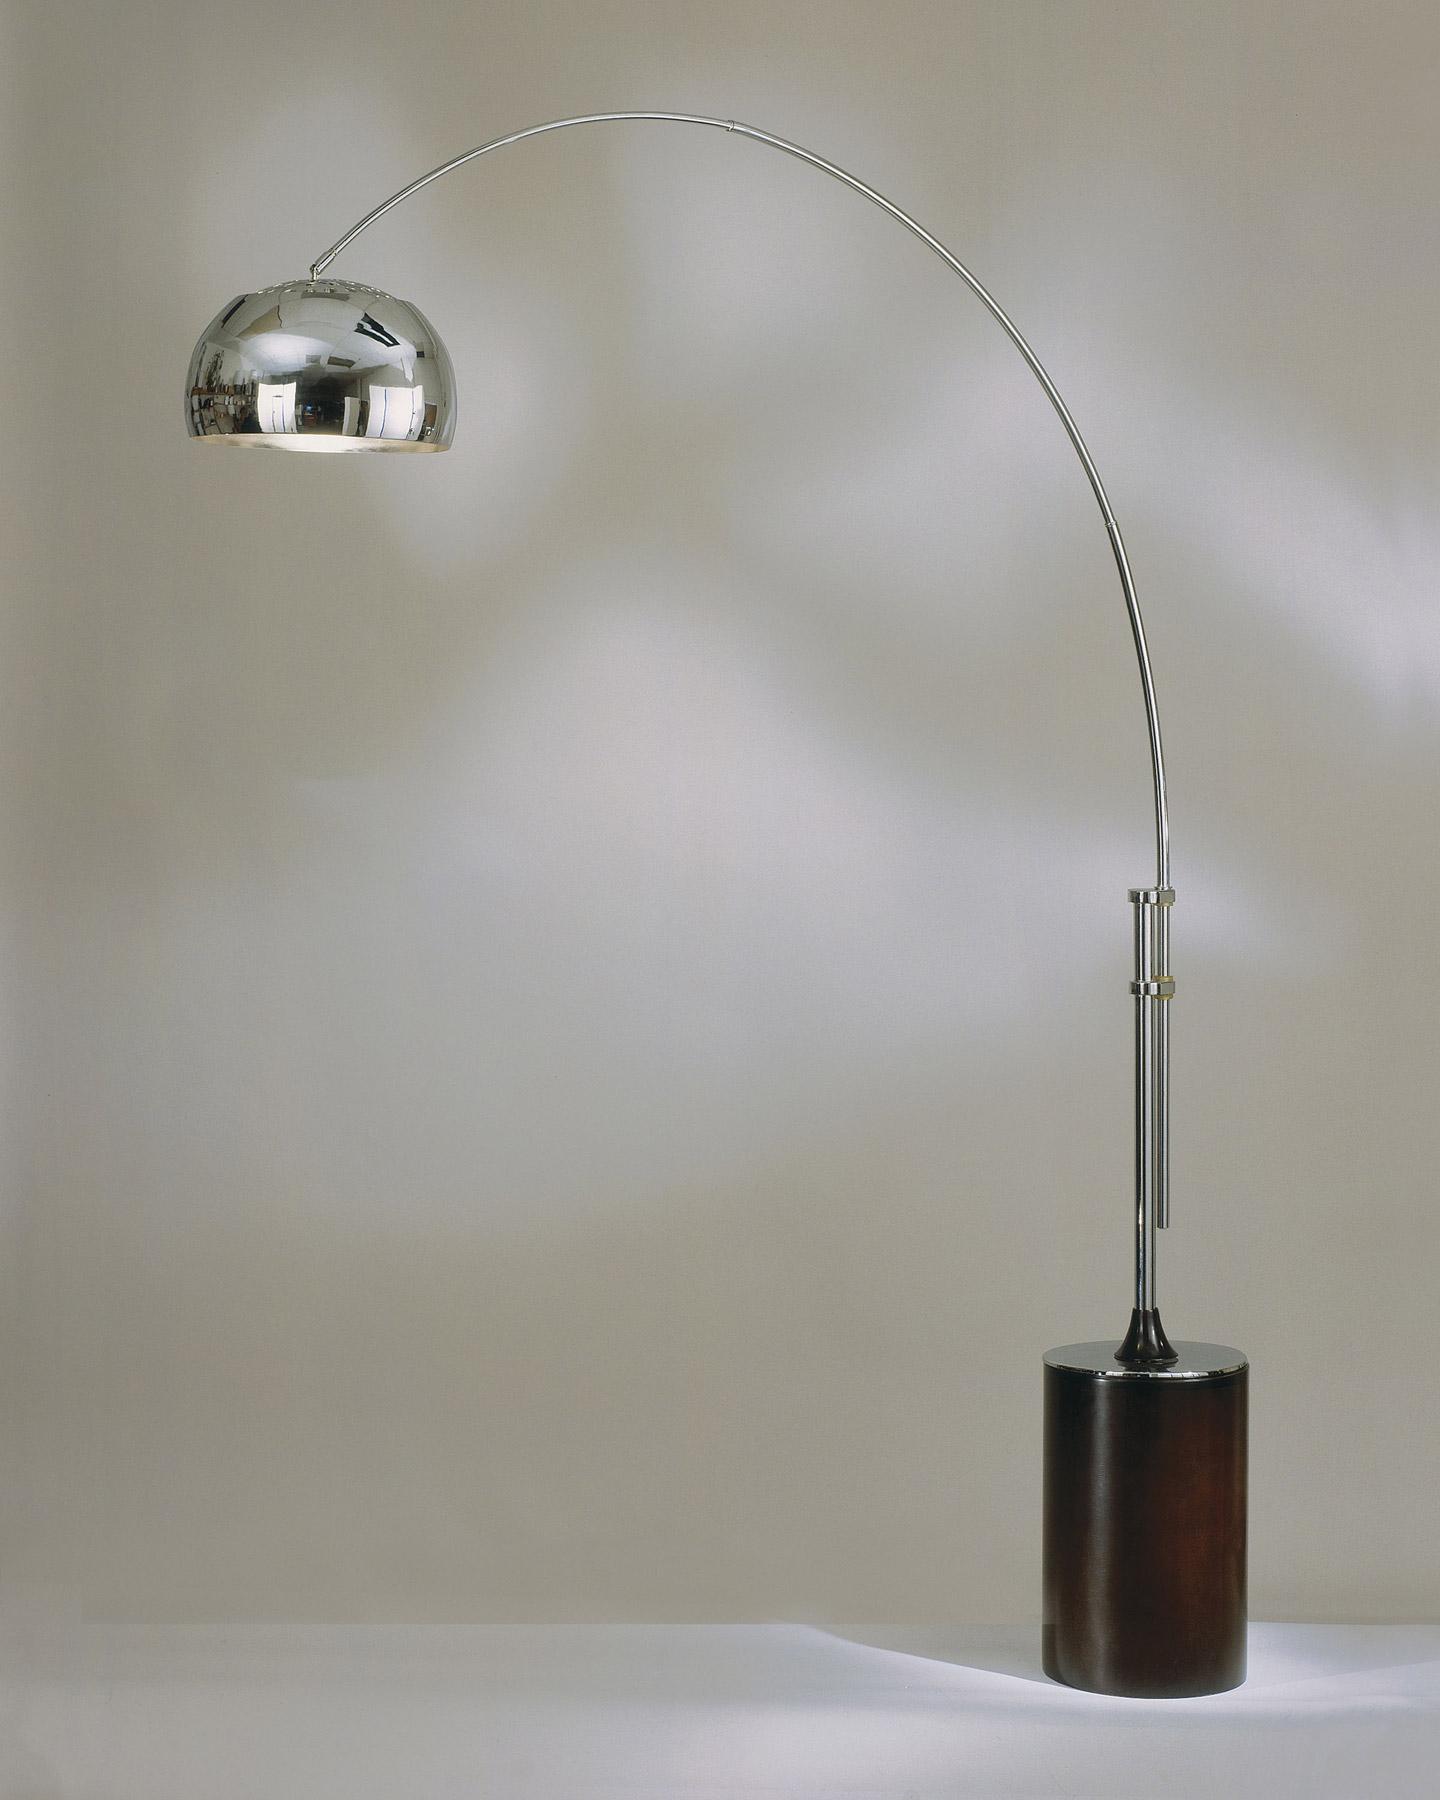 Nova Lighting 4361cx Contour Arc Floor Lamp